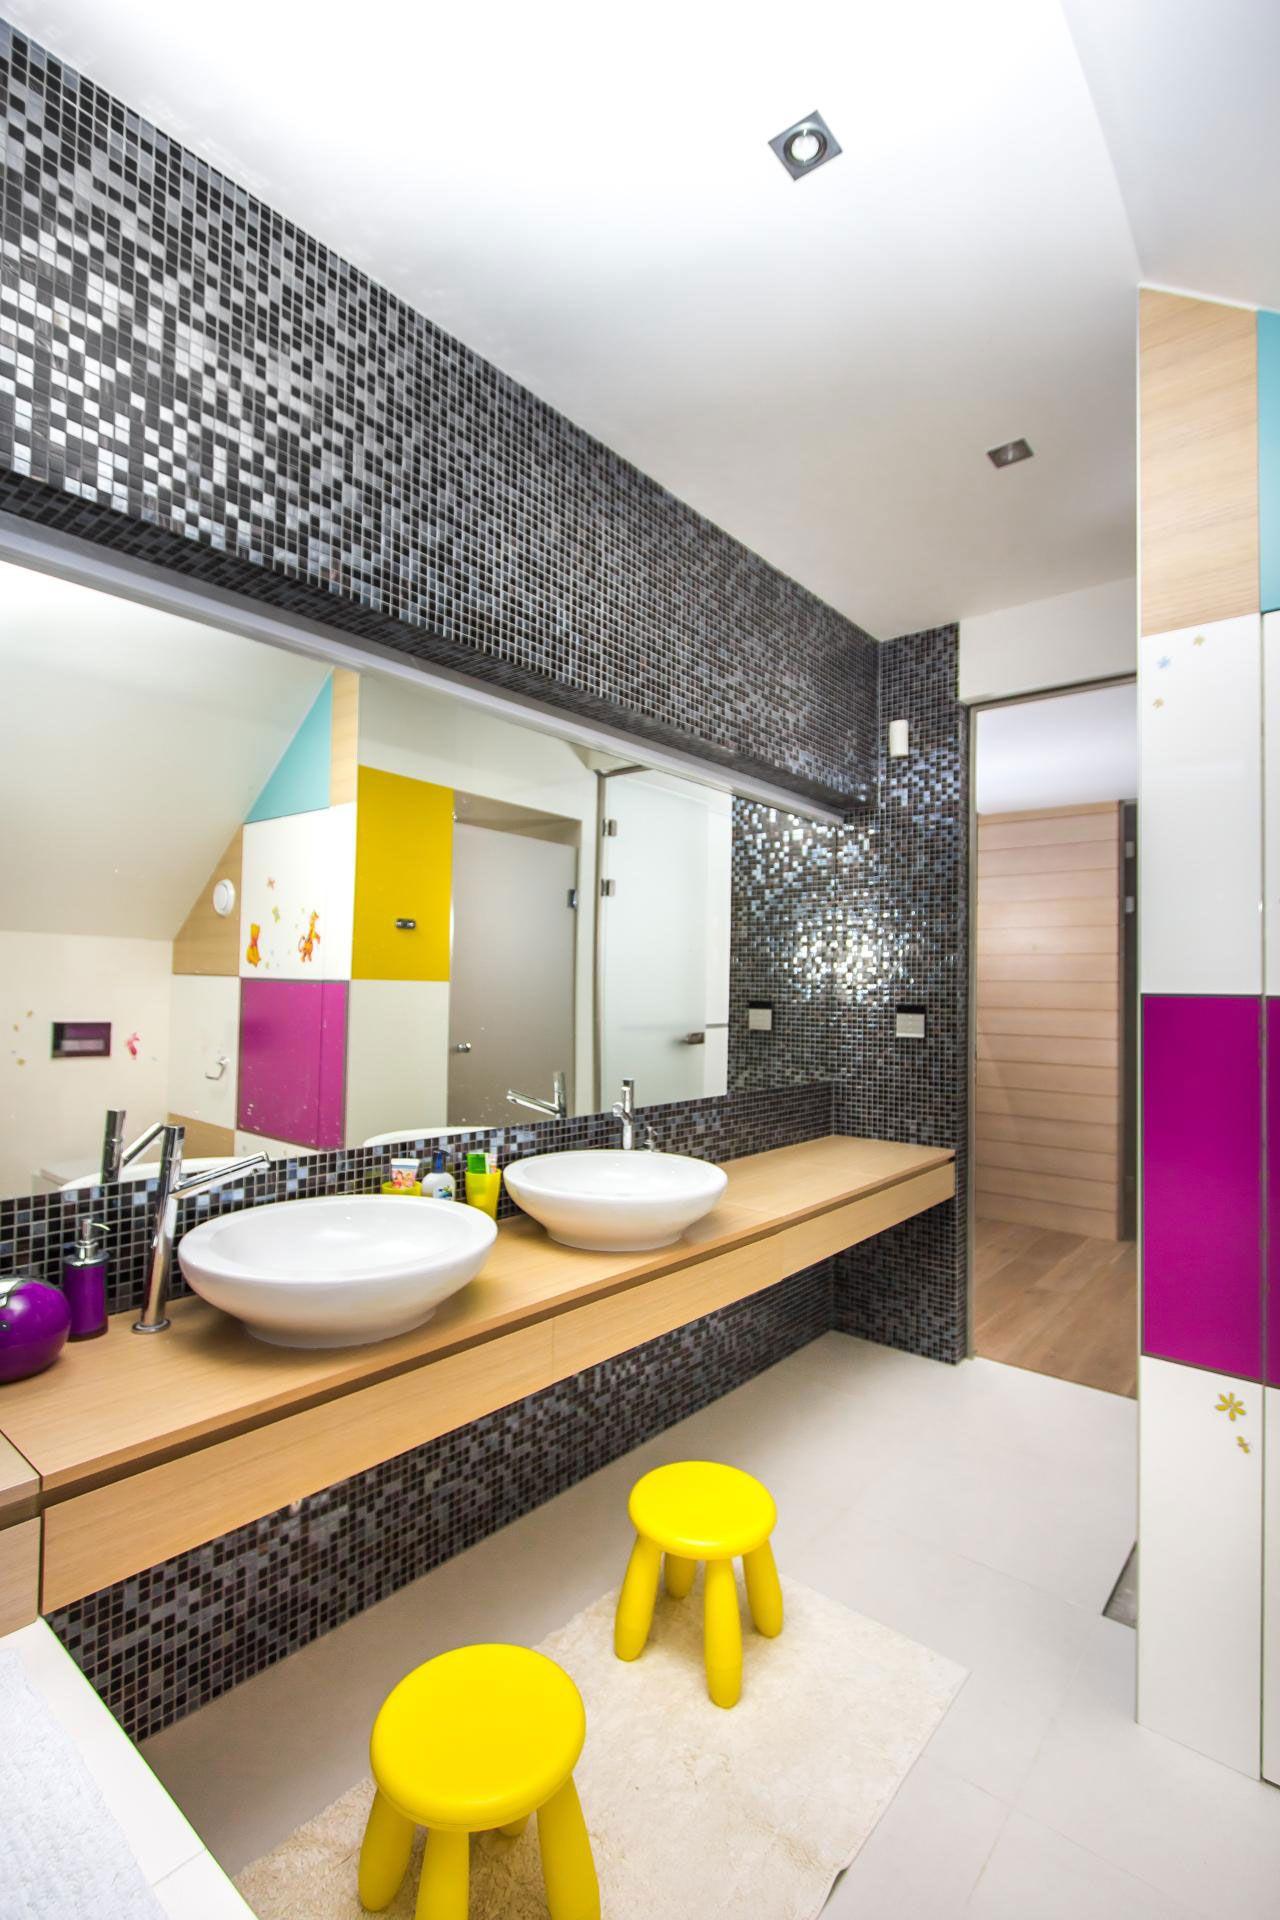 Villa M by Architektonicke Studio Atrium-25